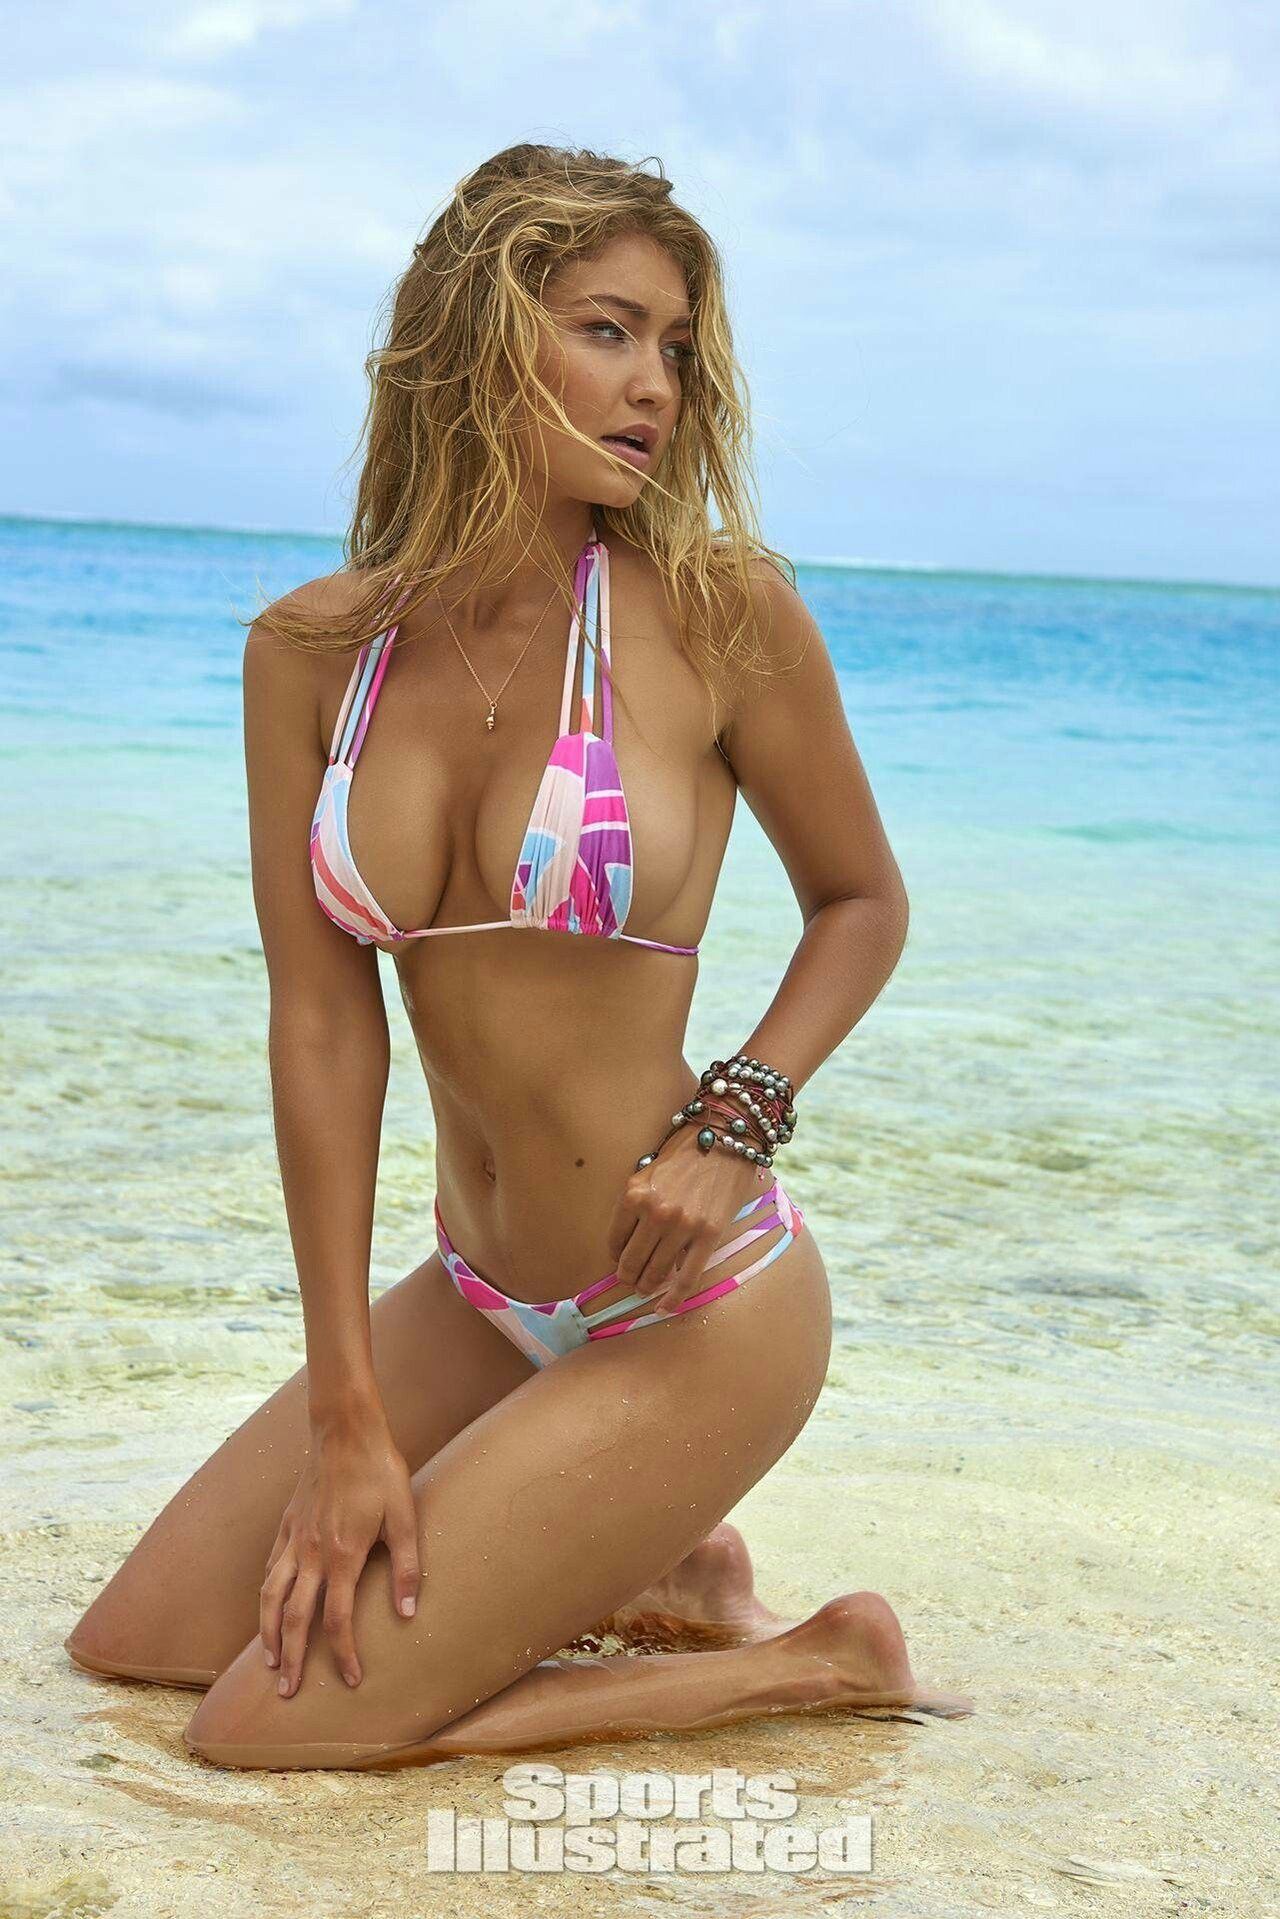 Bikini Shasta Wonder nudes (45 foto and video), Sexy, Leaked, Selfie, braless 2006